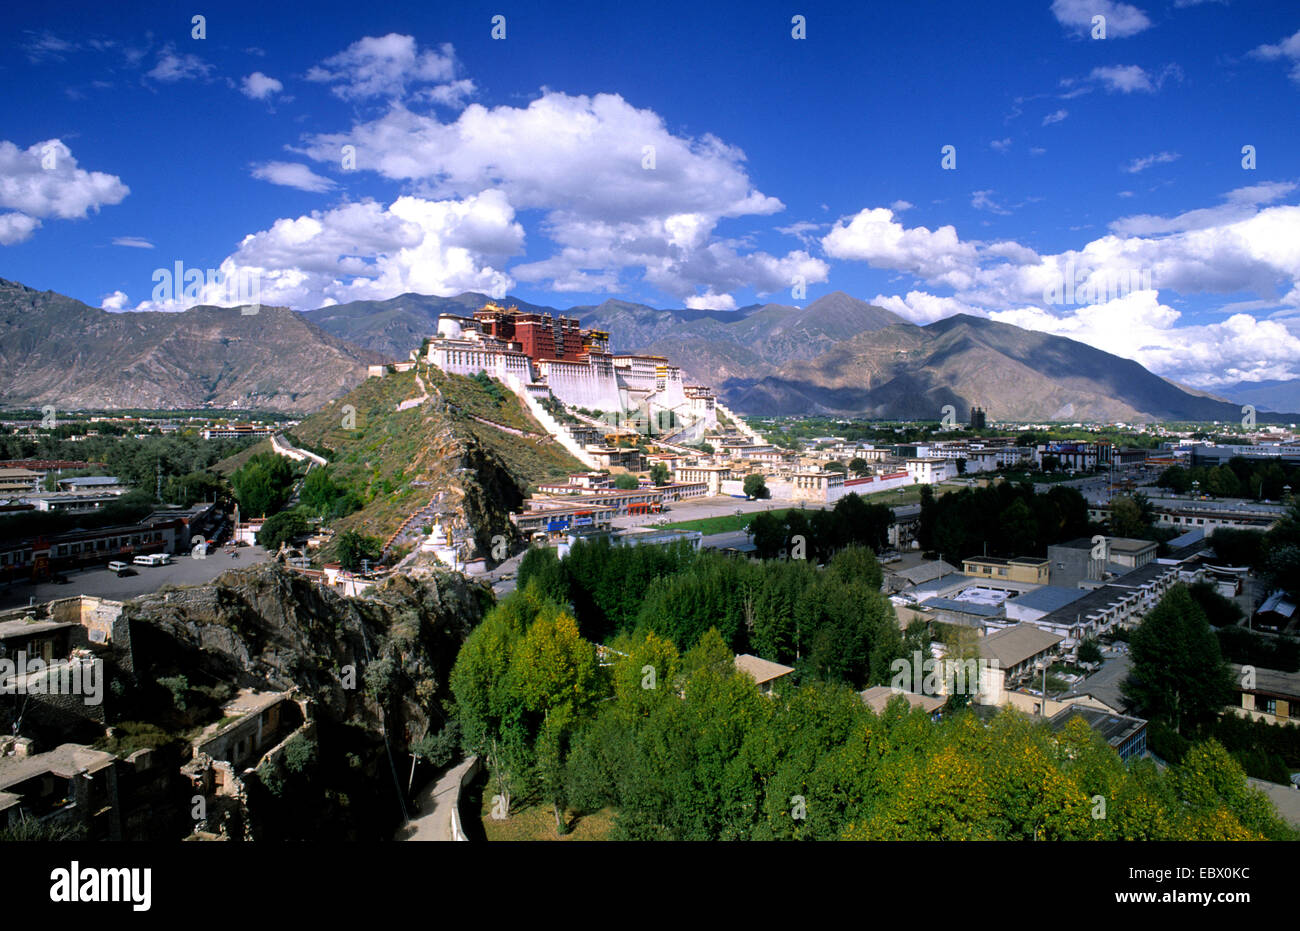 Potala Palace on mountain range, the home of the Dalai Lama, China, Tibet, Lhasa - Stock Image